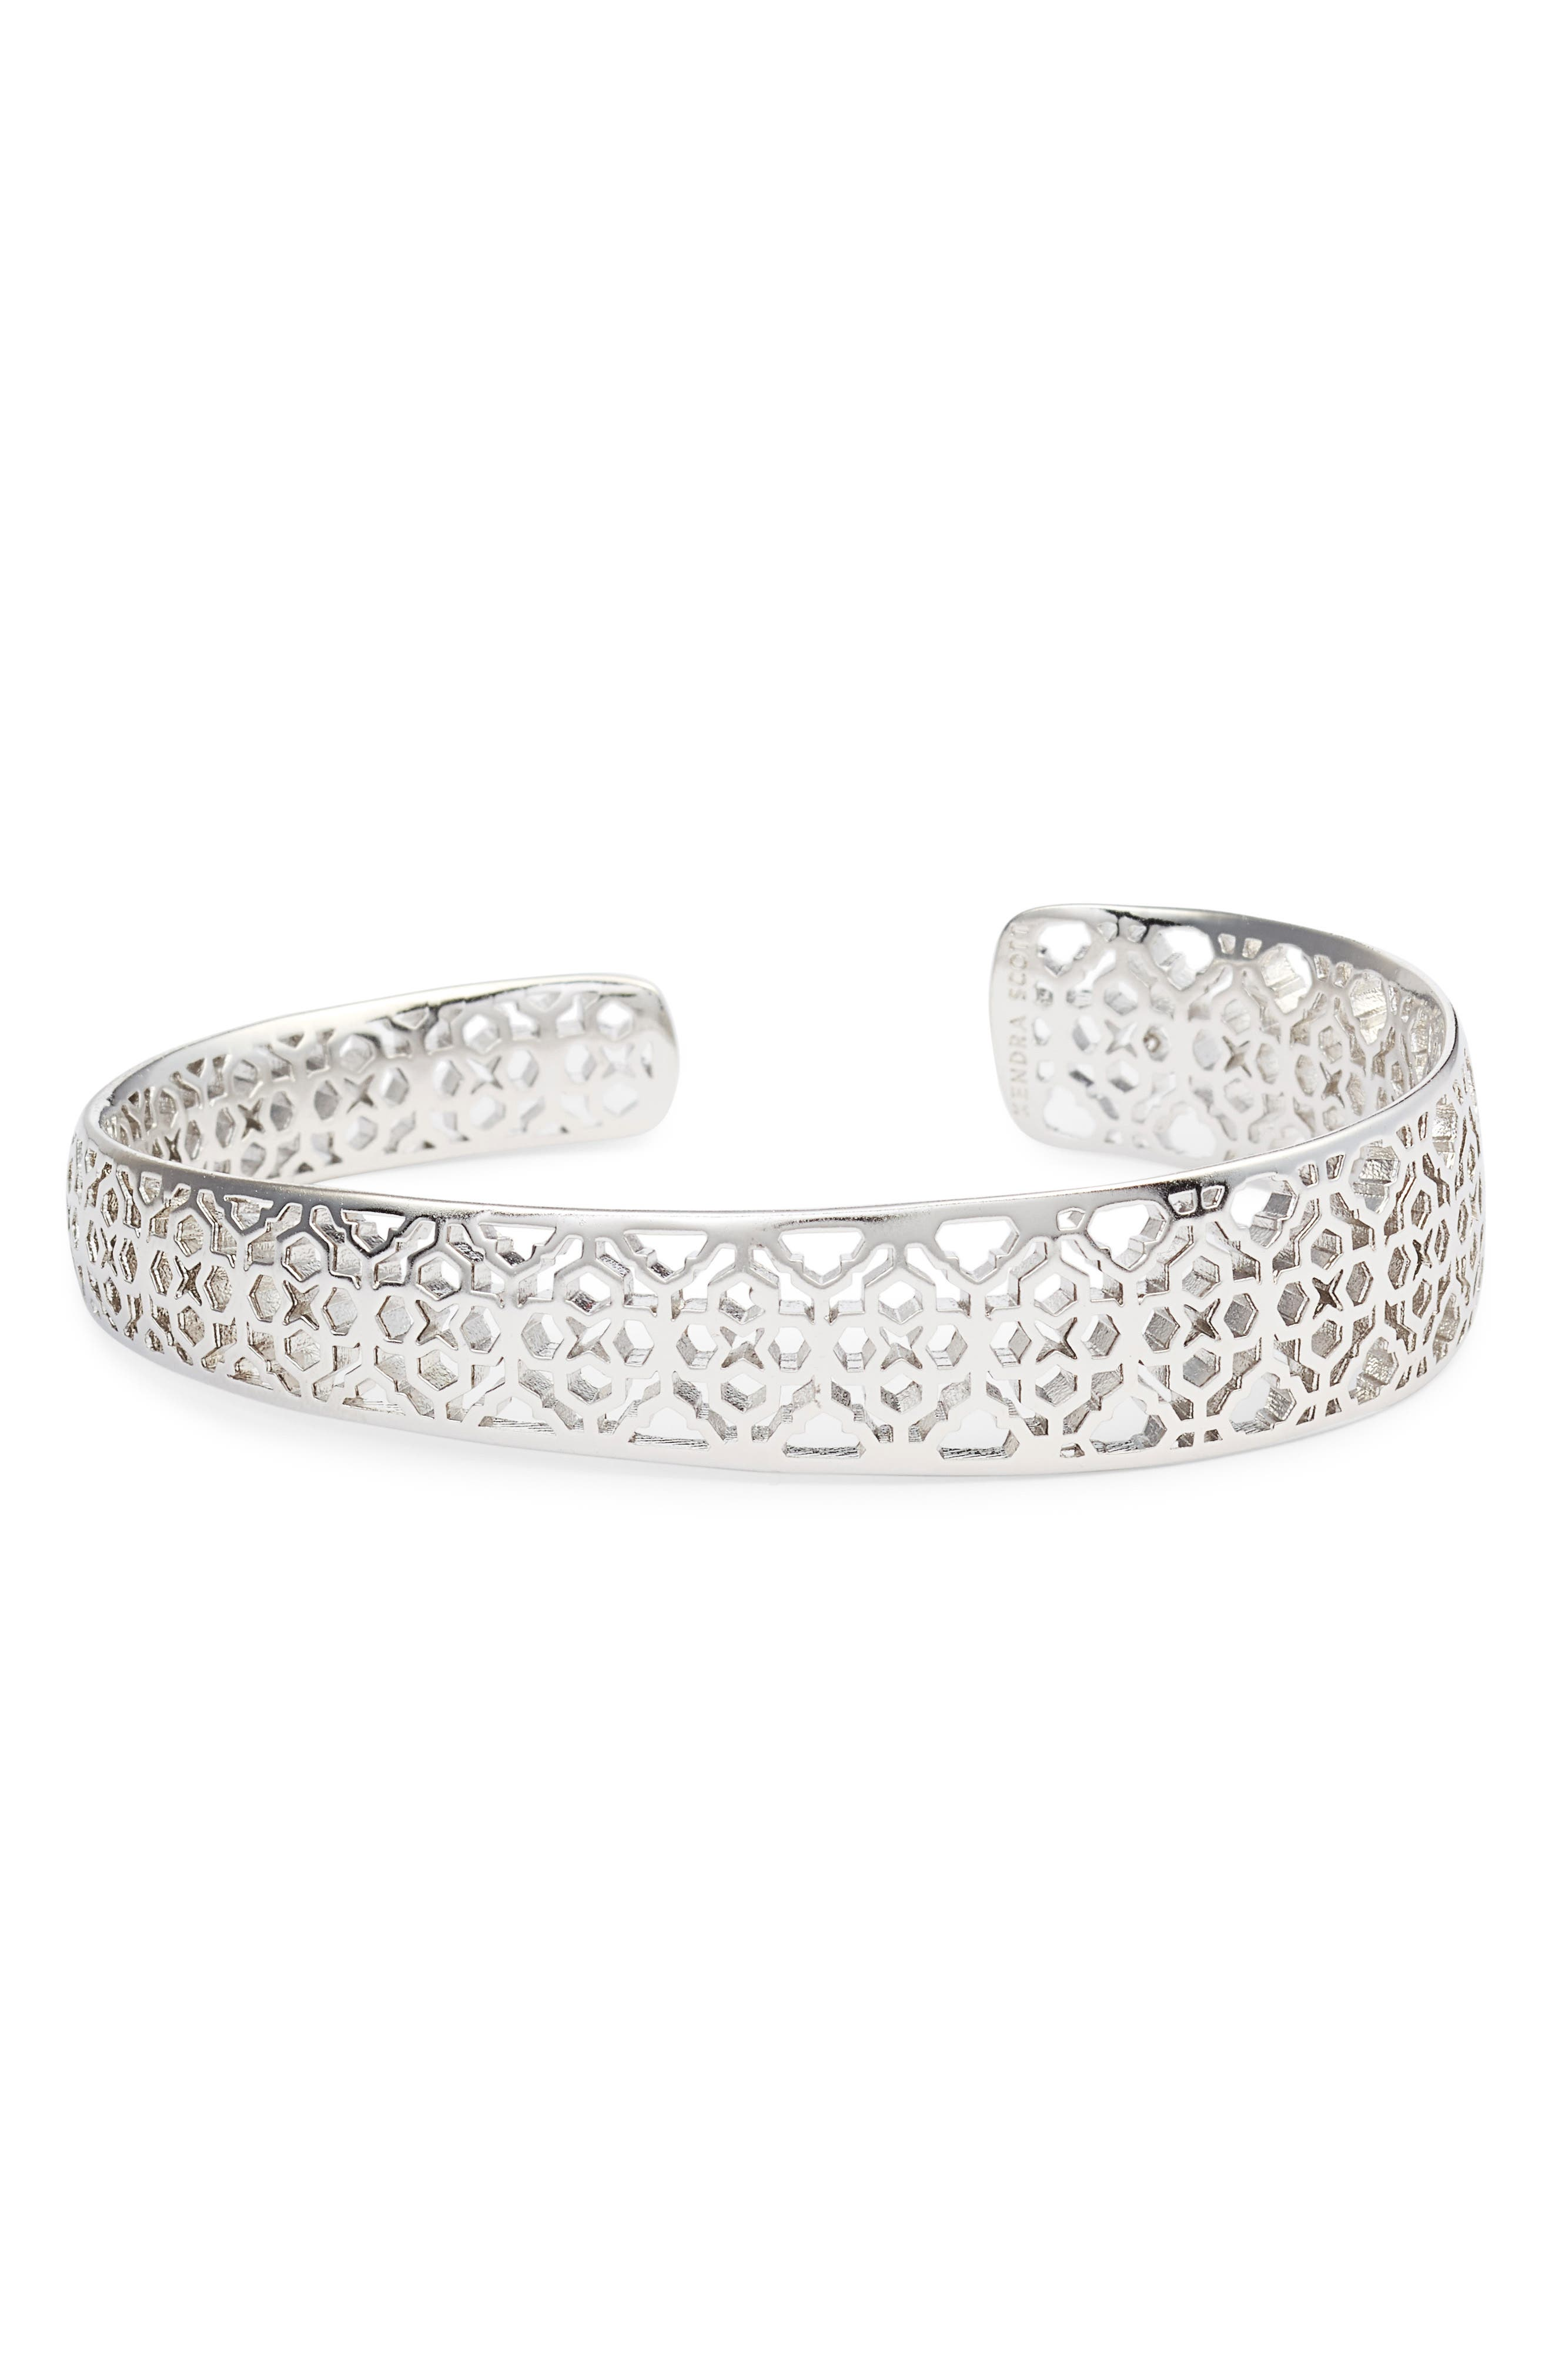 KENDRA SCOTT Uma Filigree Bracelet, Main, color, SILVER FILIGREE